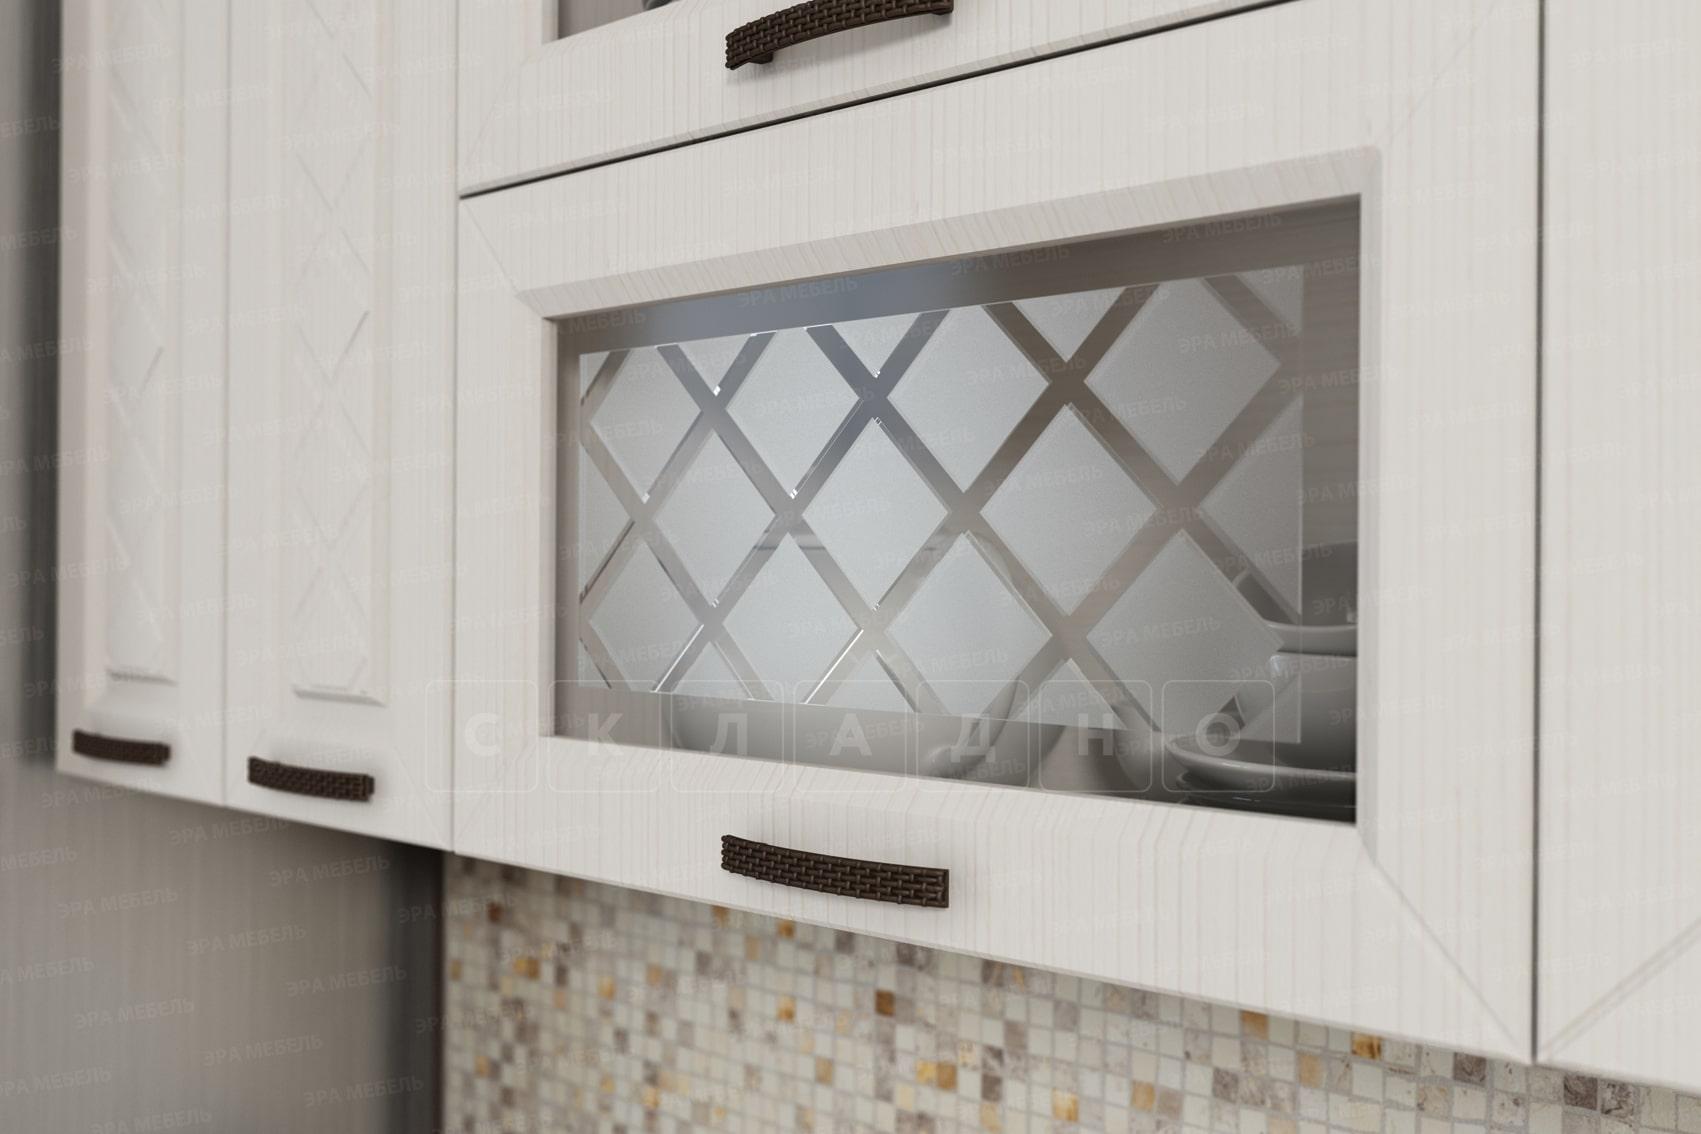 Кухня угловая Агава 1,85х2,85м фото 5 | интернет-магазин Складно